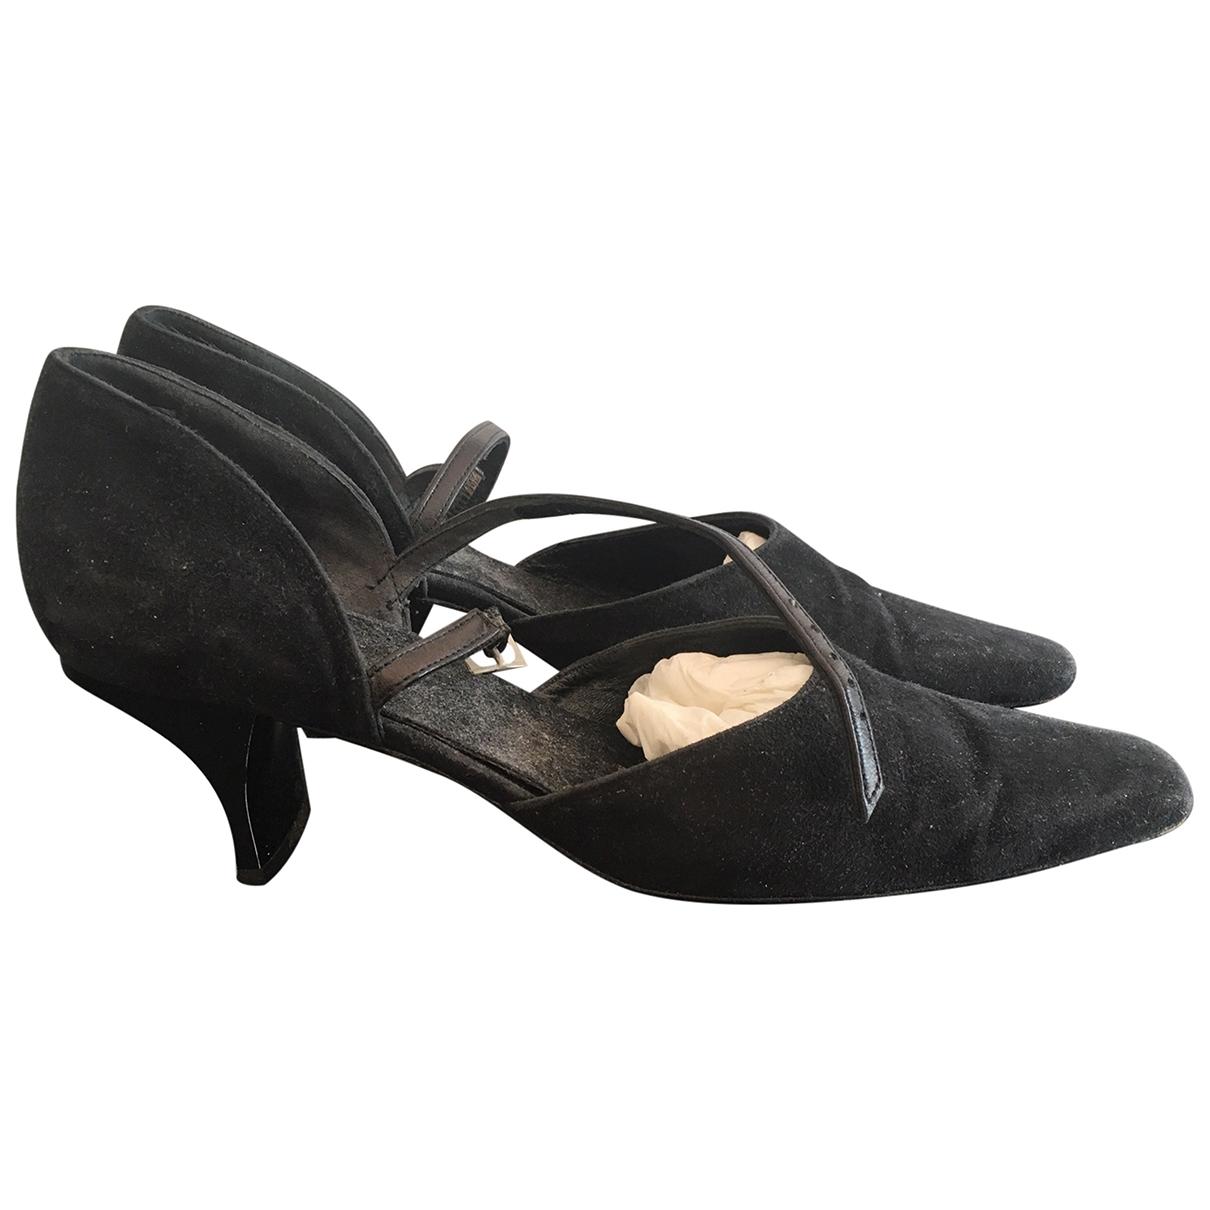 Robert Clergerie \N Black Pony-style calfskin Heels for Women 6.5 US